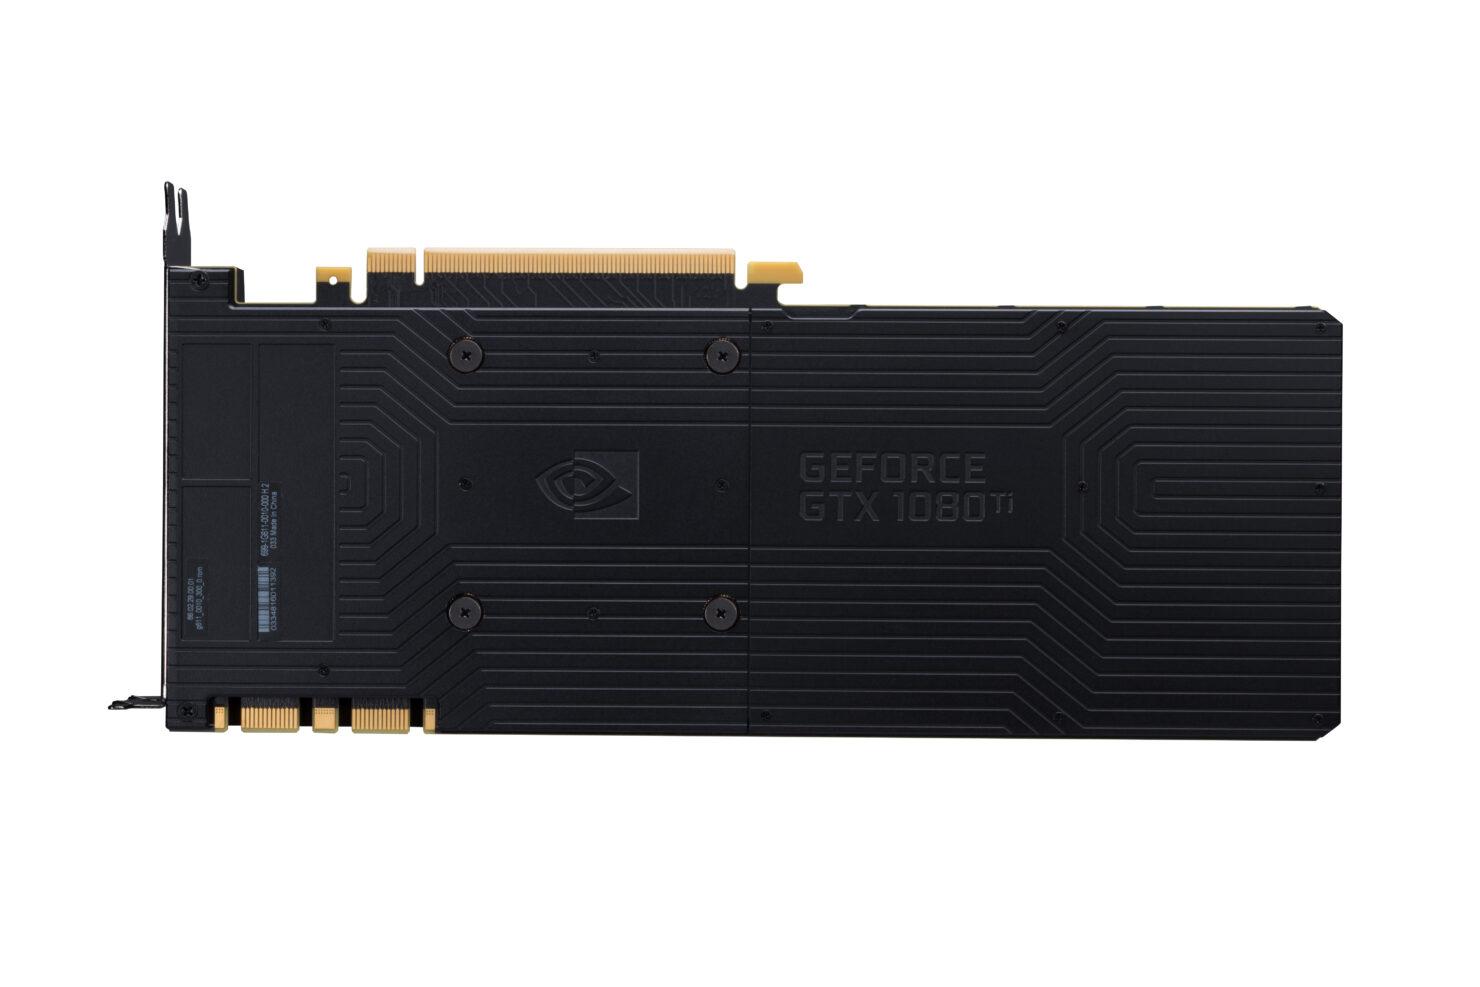 nvidia-geforce-gtx-1080-ti_2